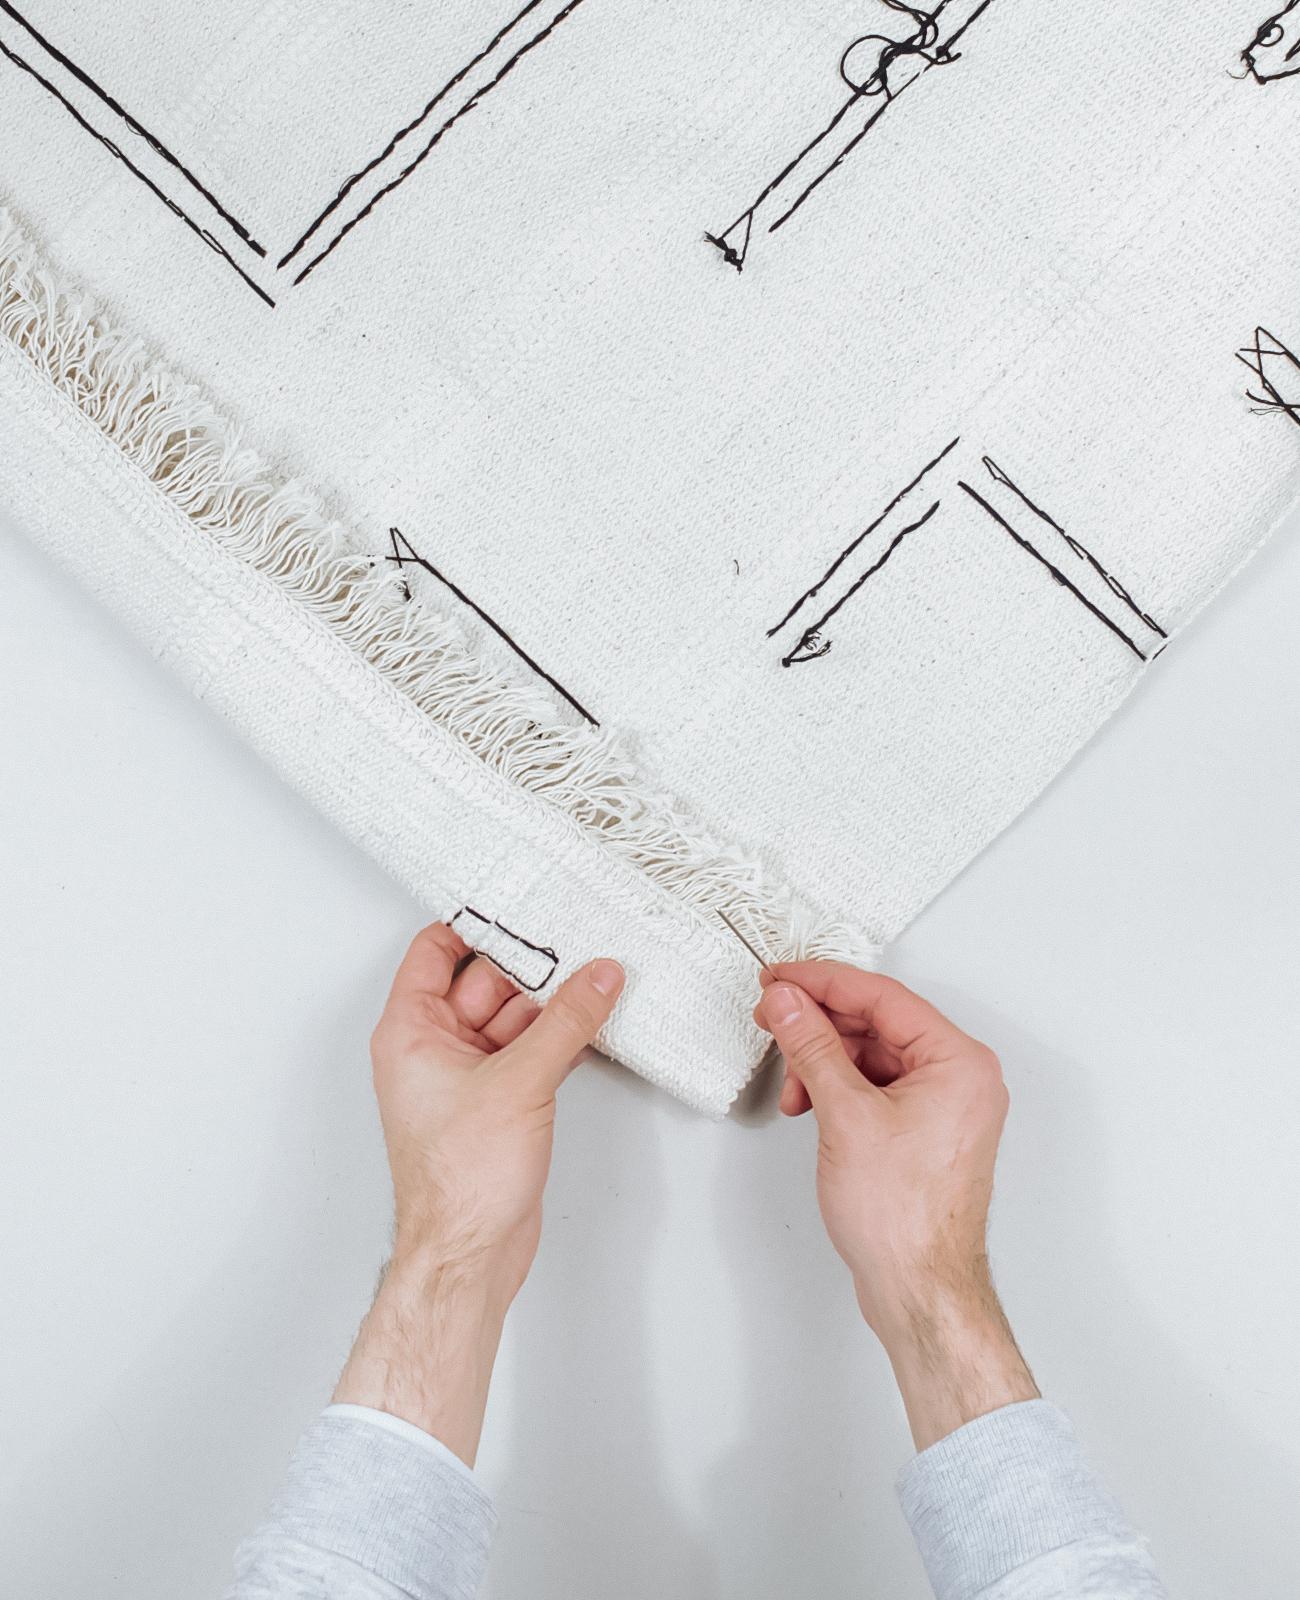 tapis deco murale boheme broderie Ikea Hack tuto dia etape 3